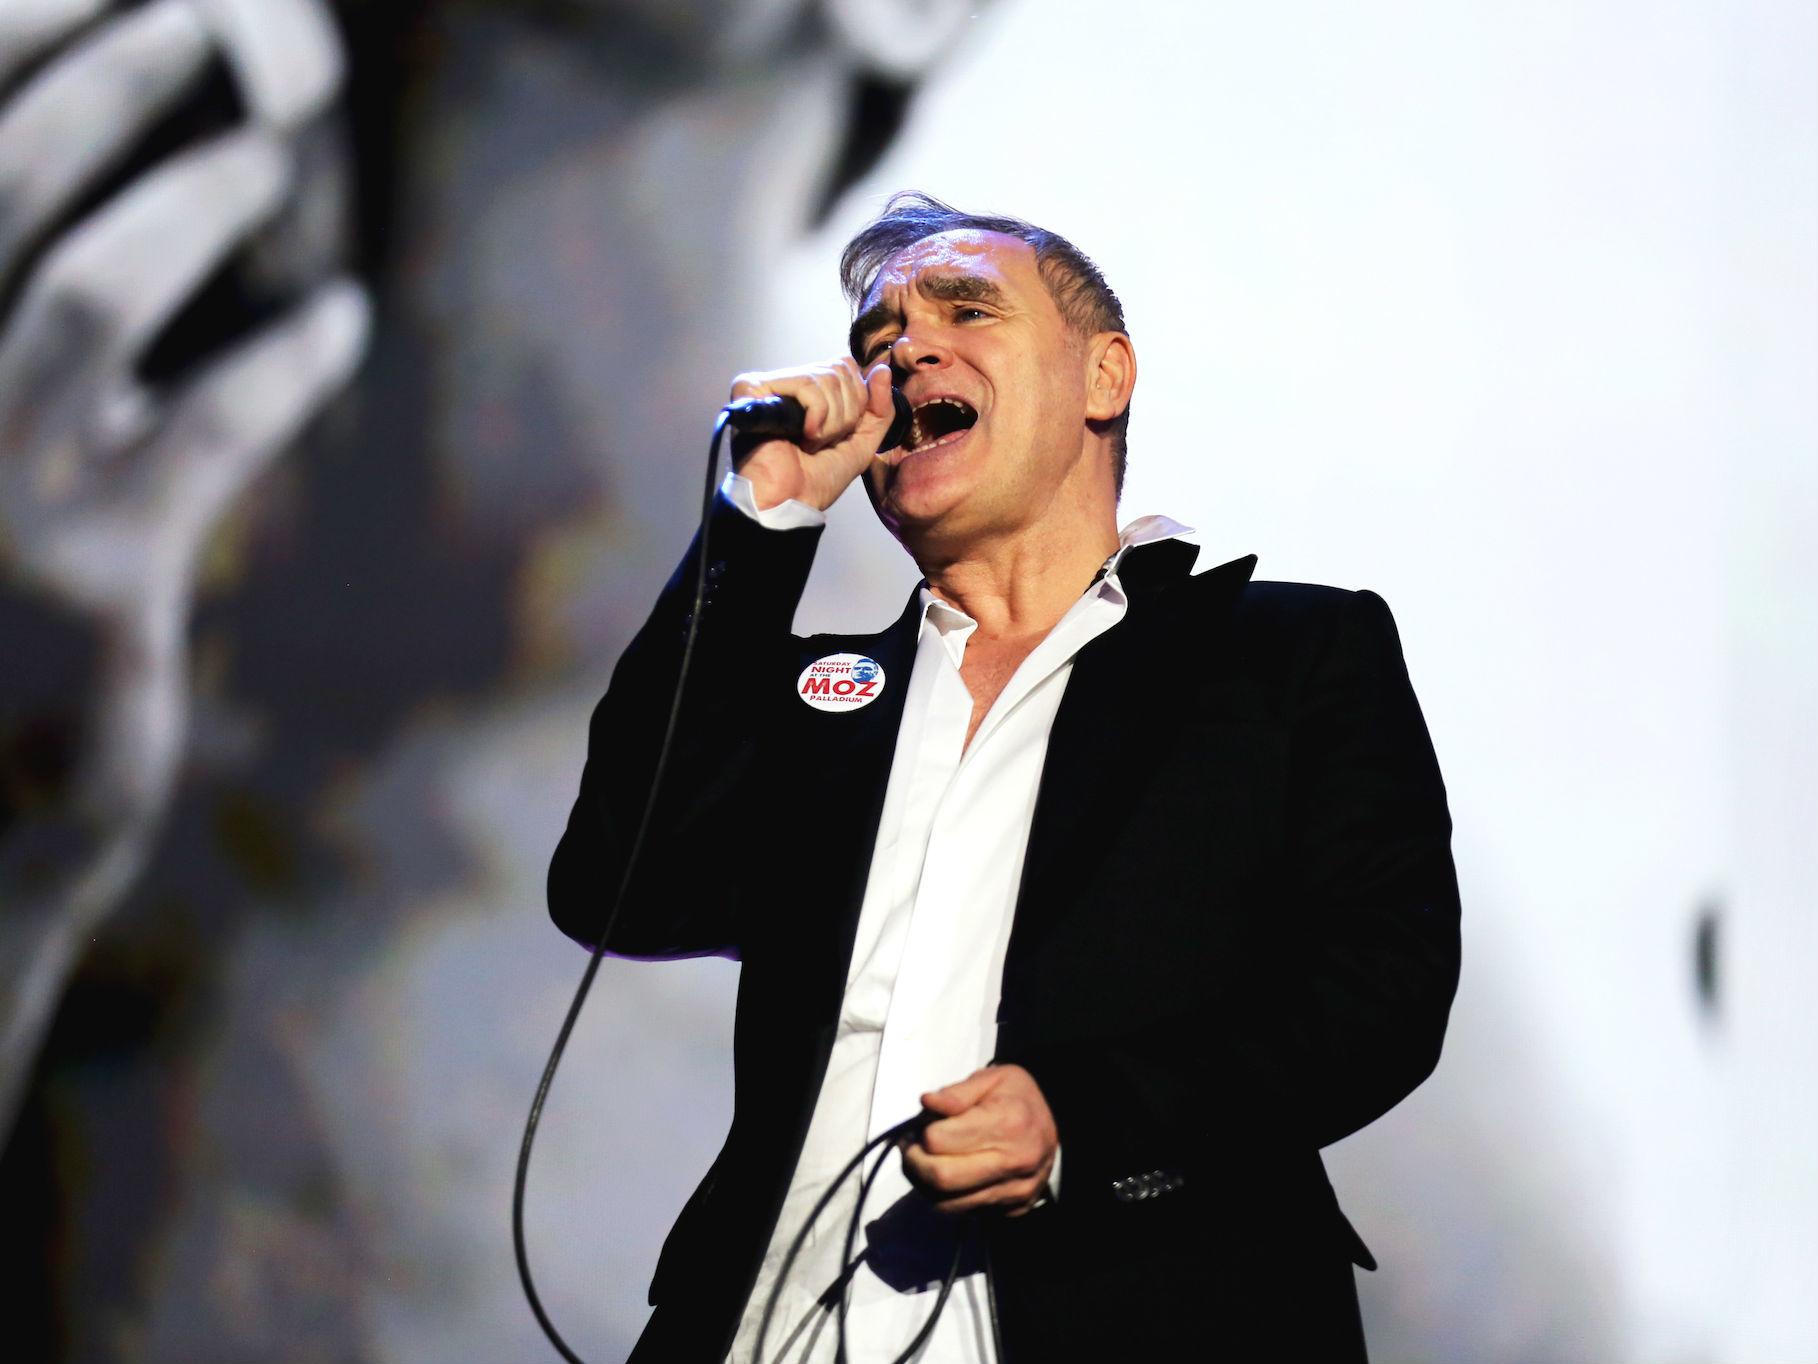 Morrissey en Vive Latino 2018